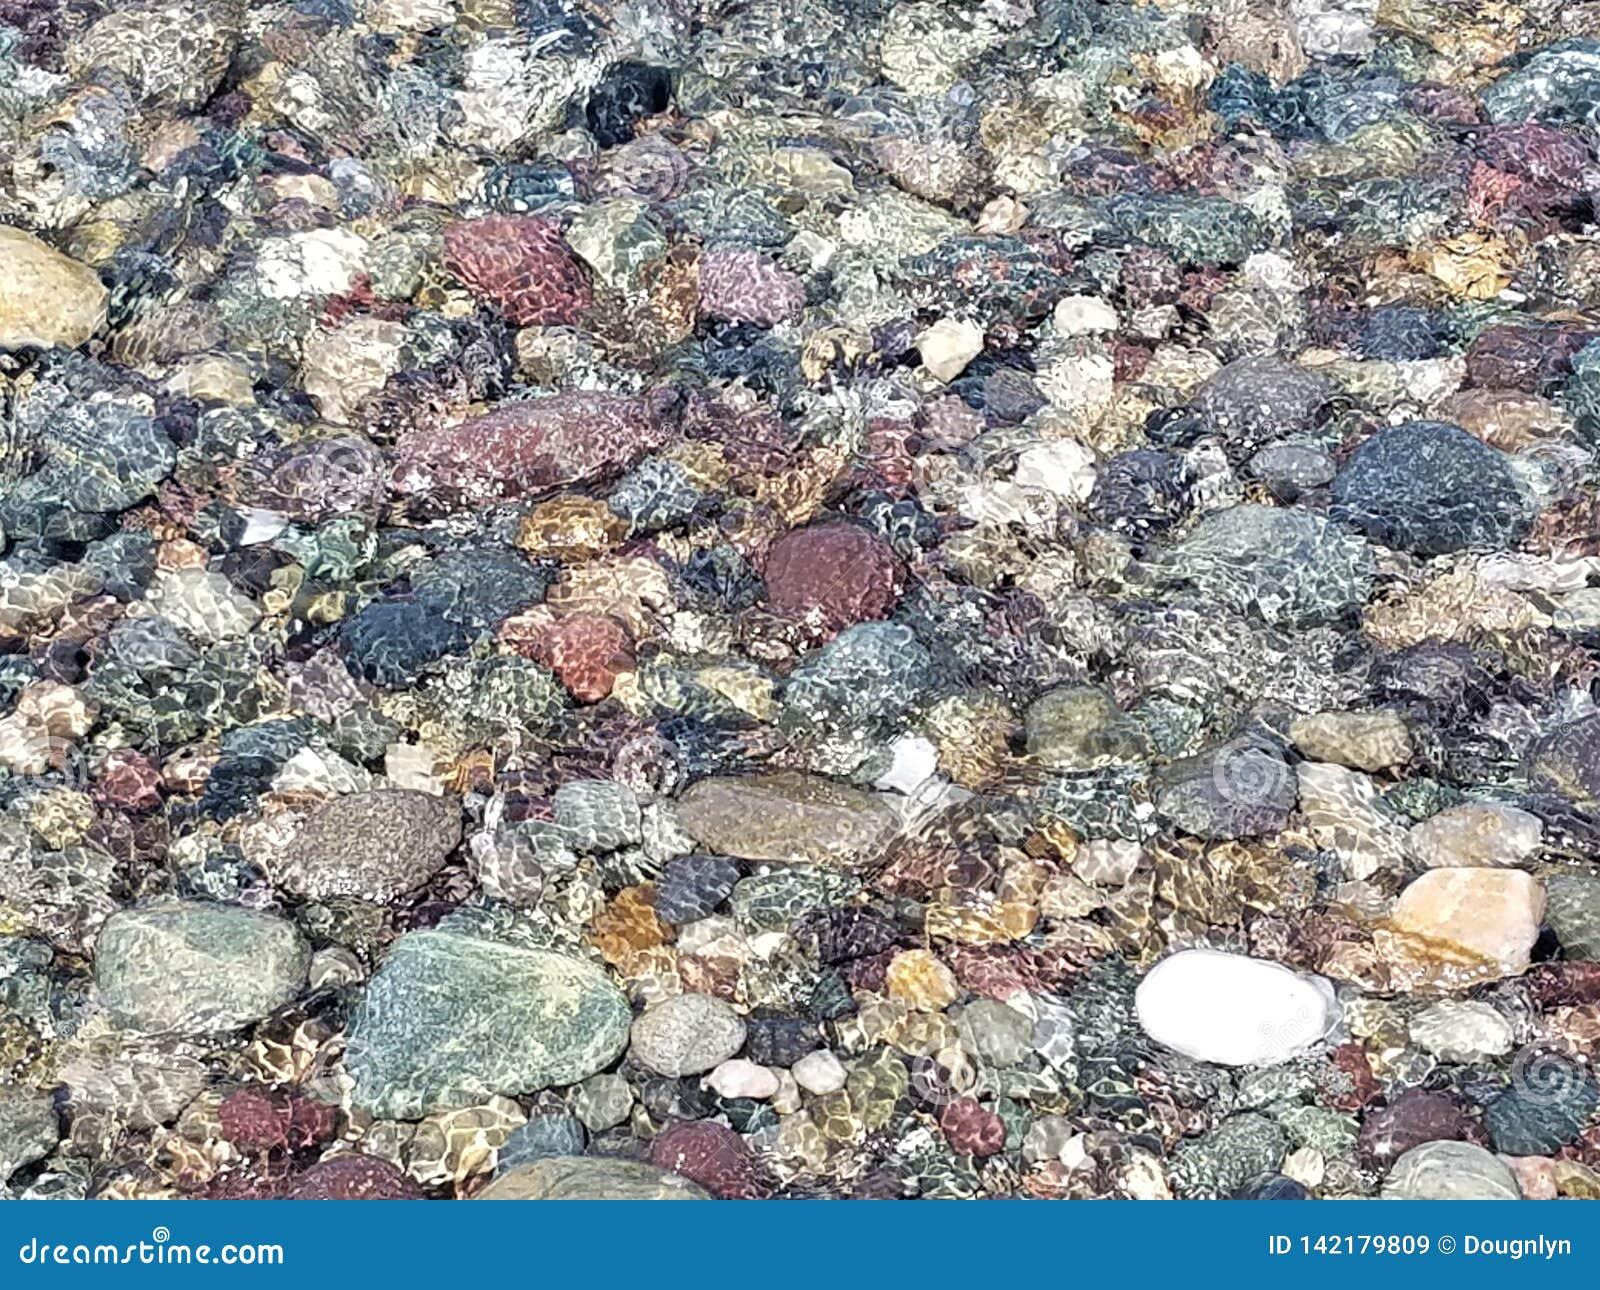 Colorful Rocks Under Ocean Surf New England USA Coastline